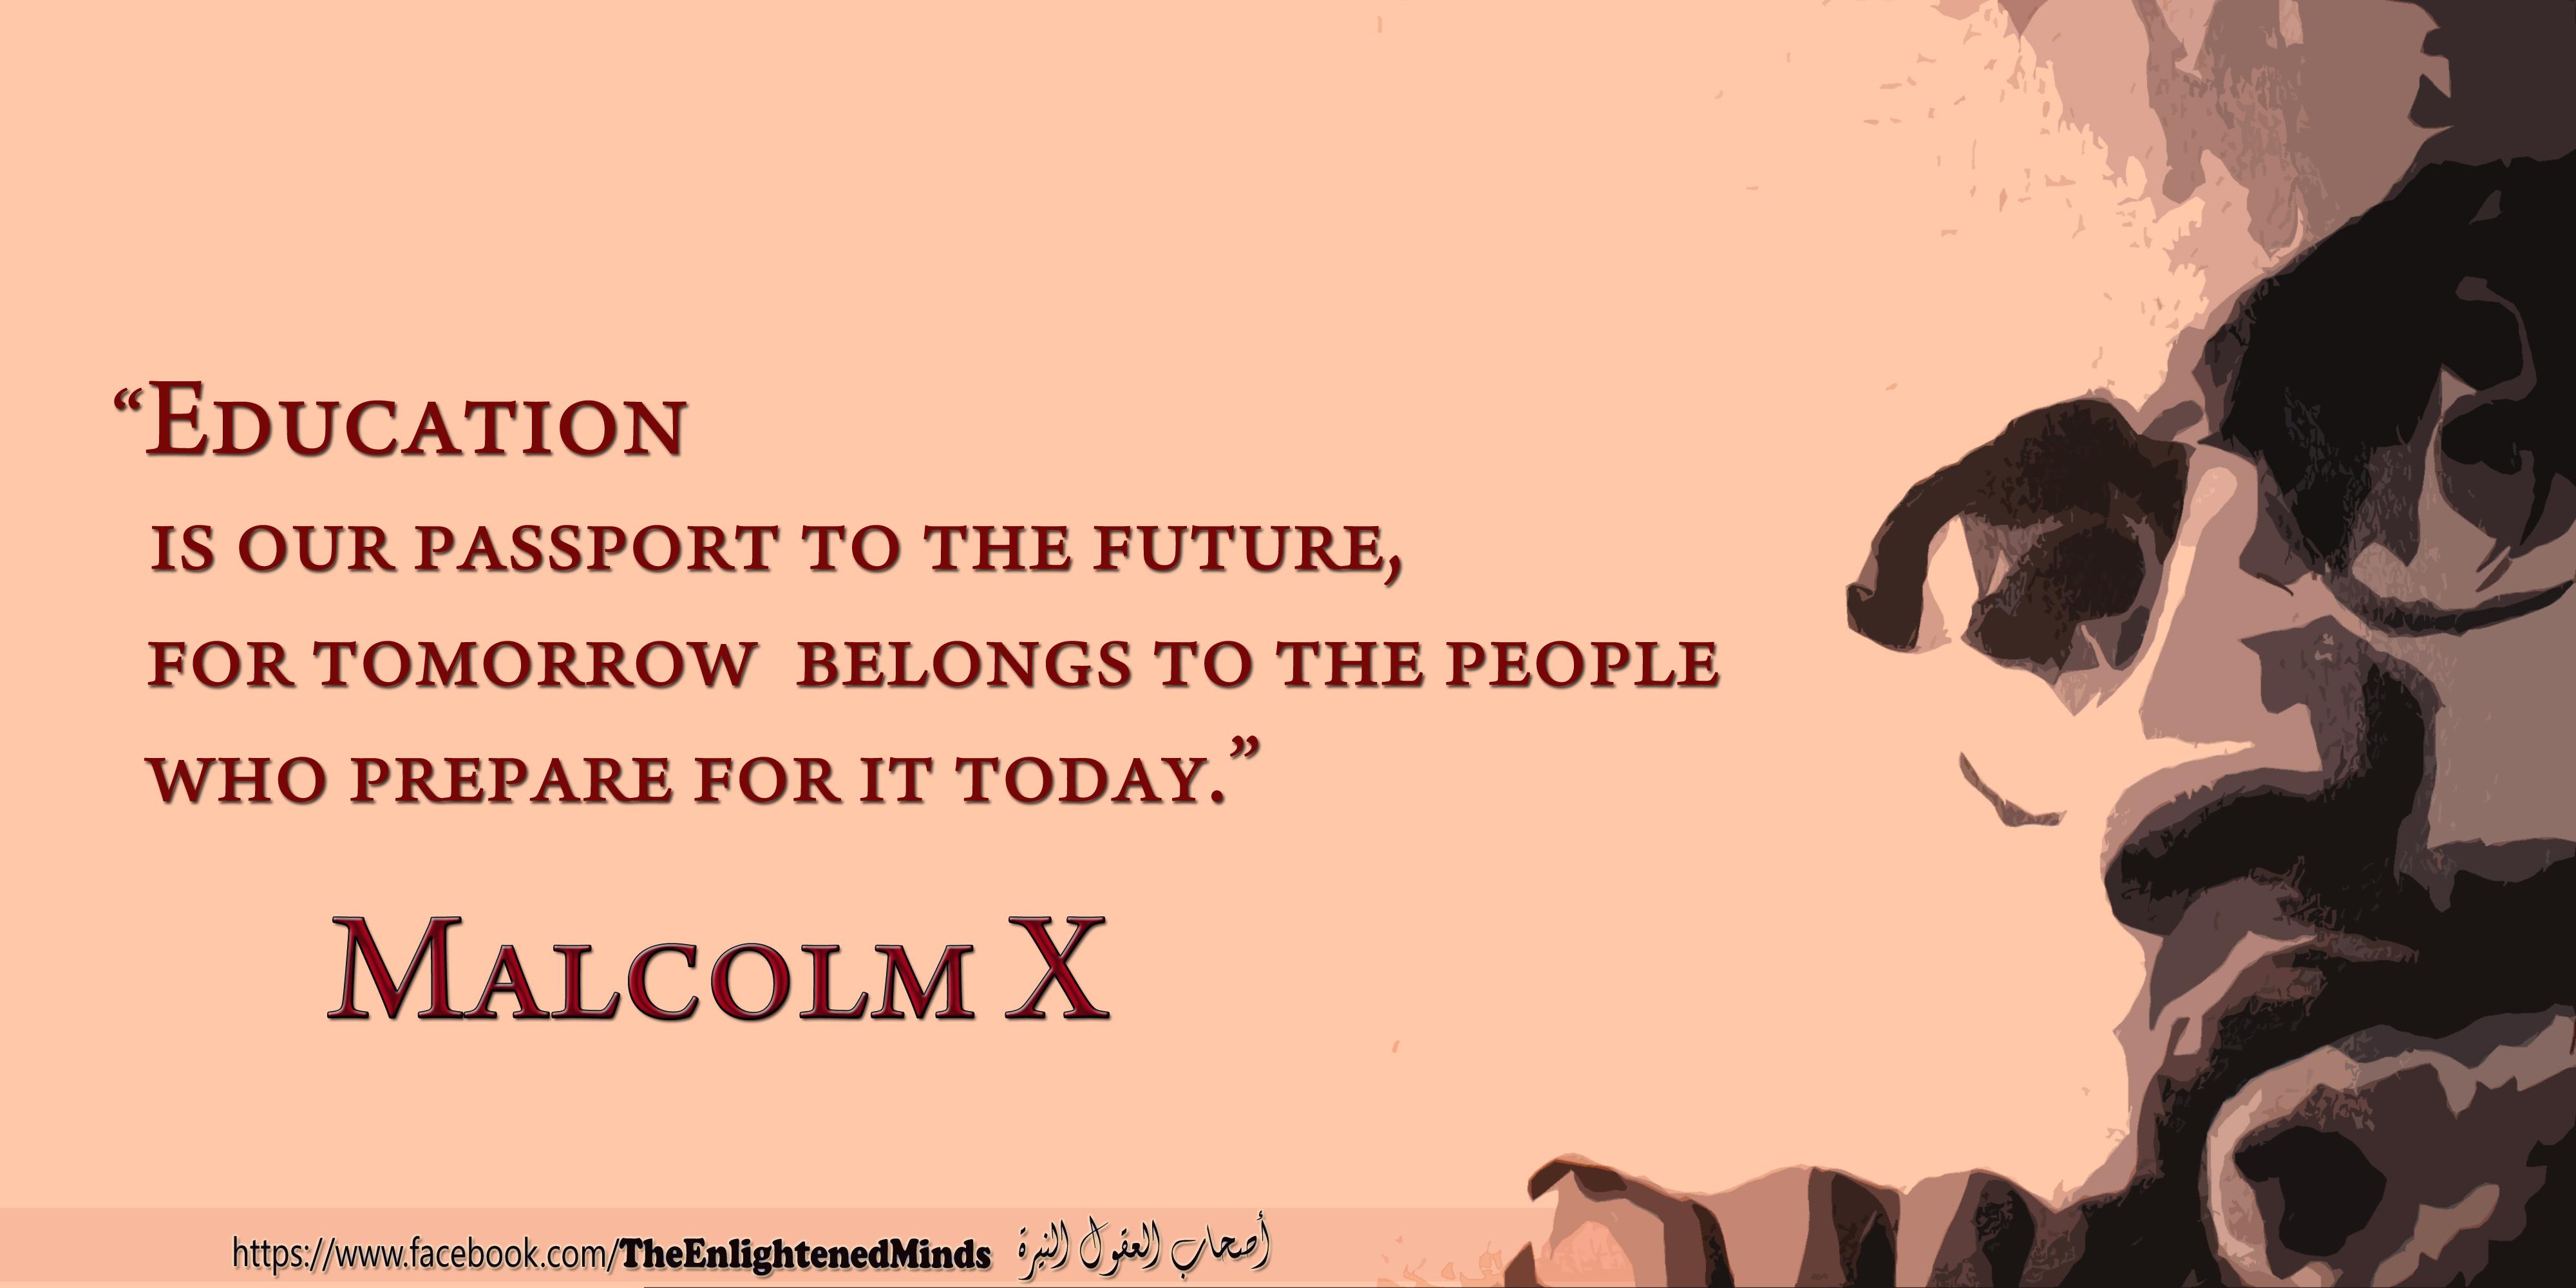 Malcolm X quote #1